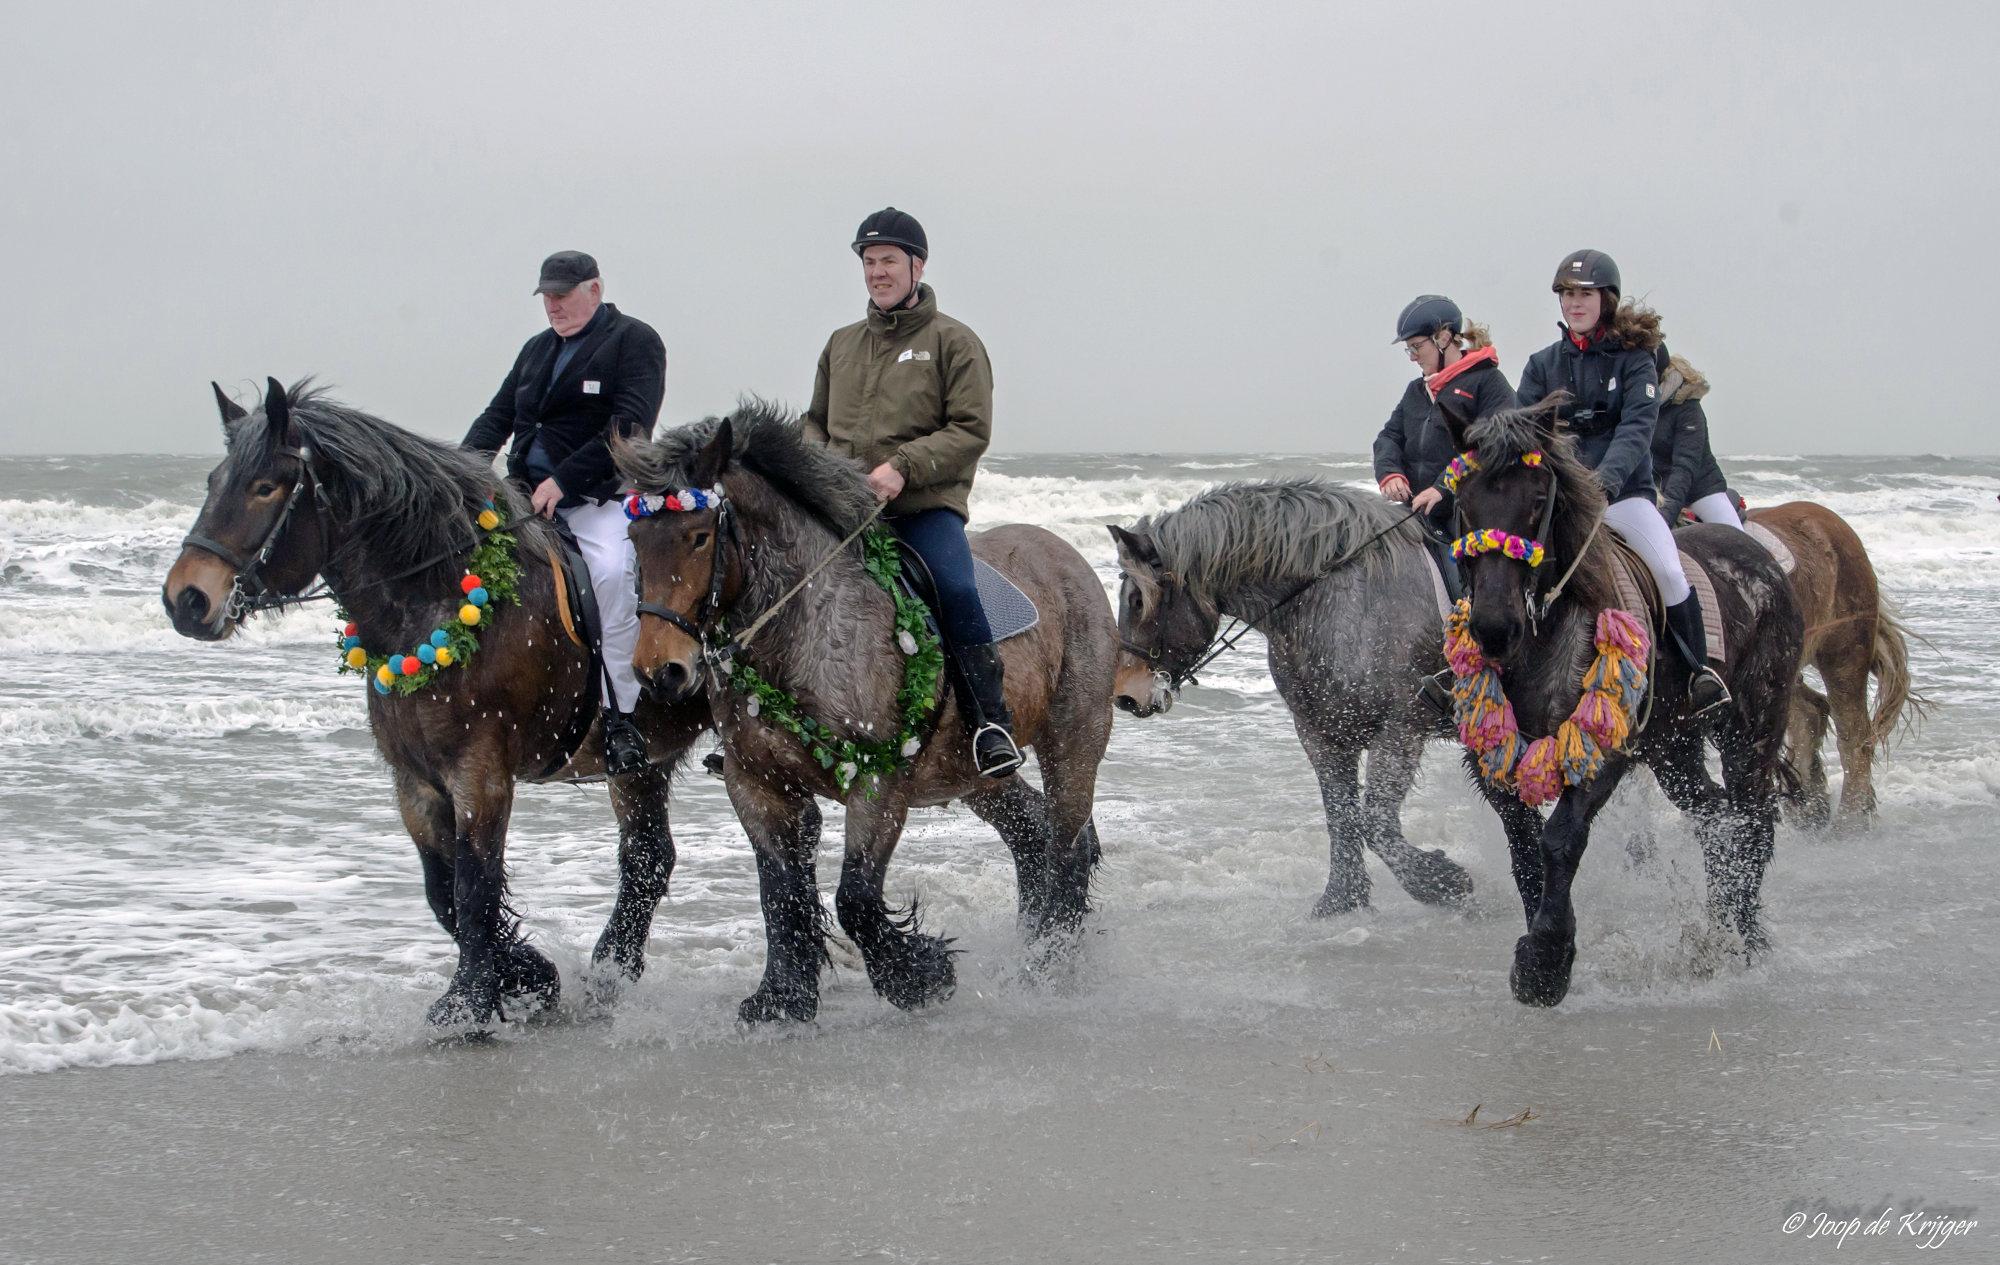 Paddling Horses